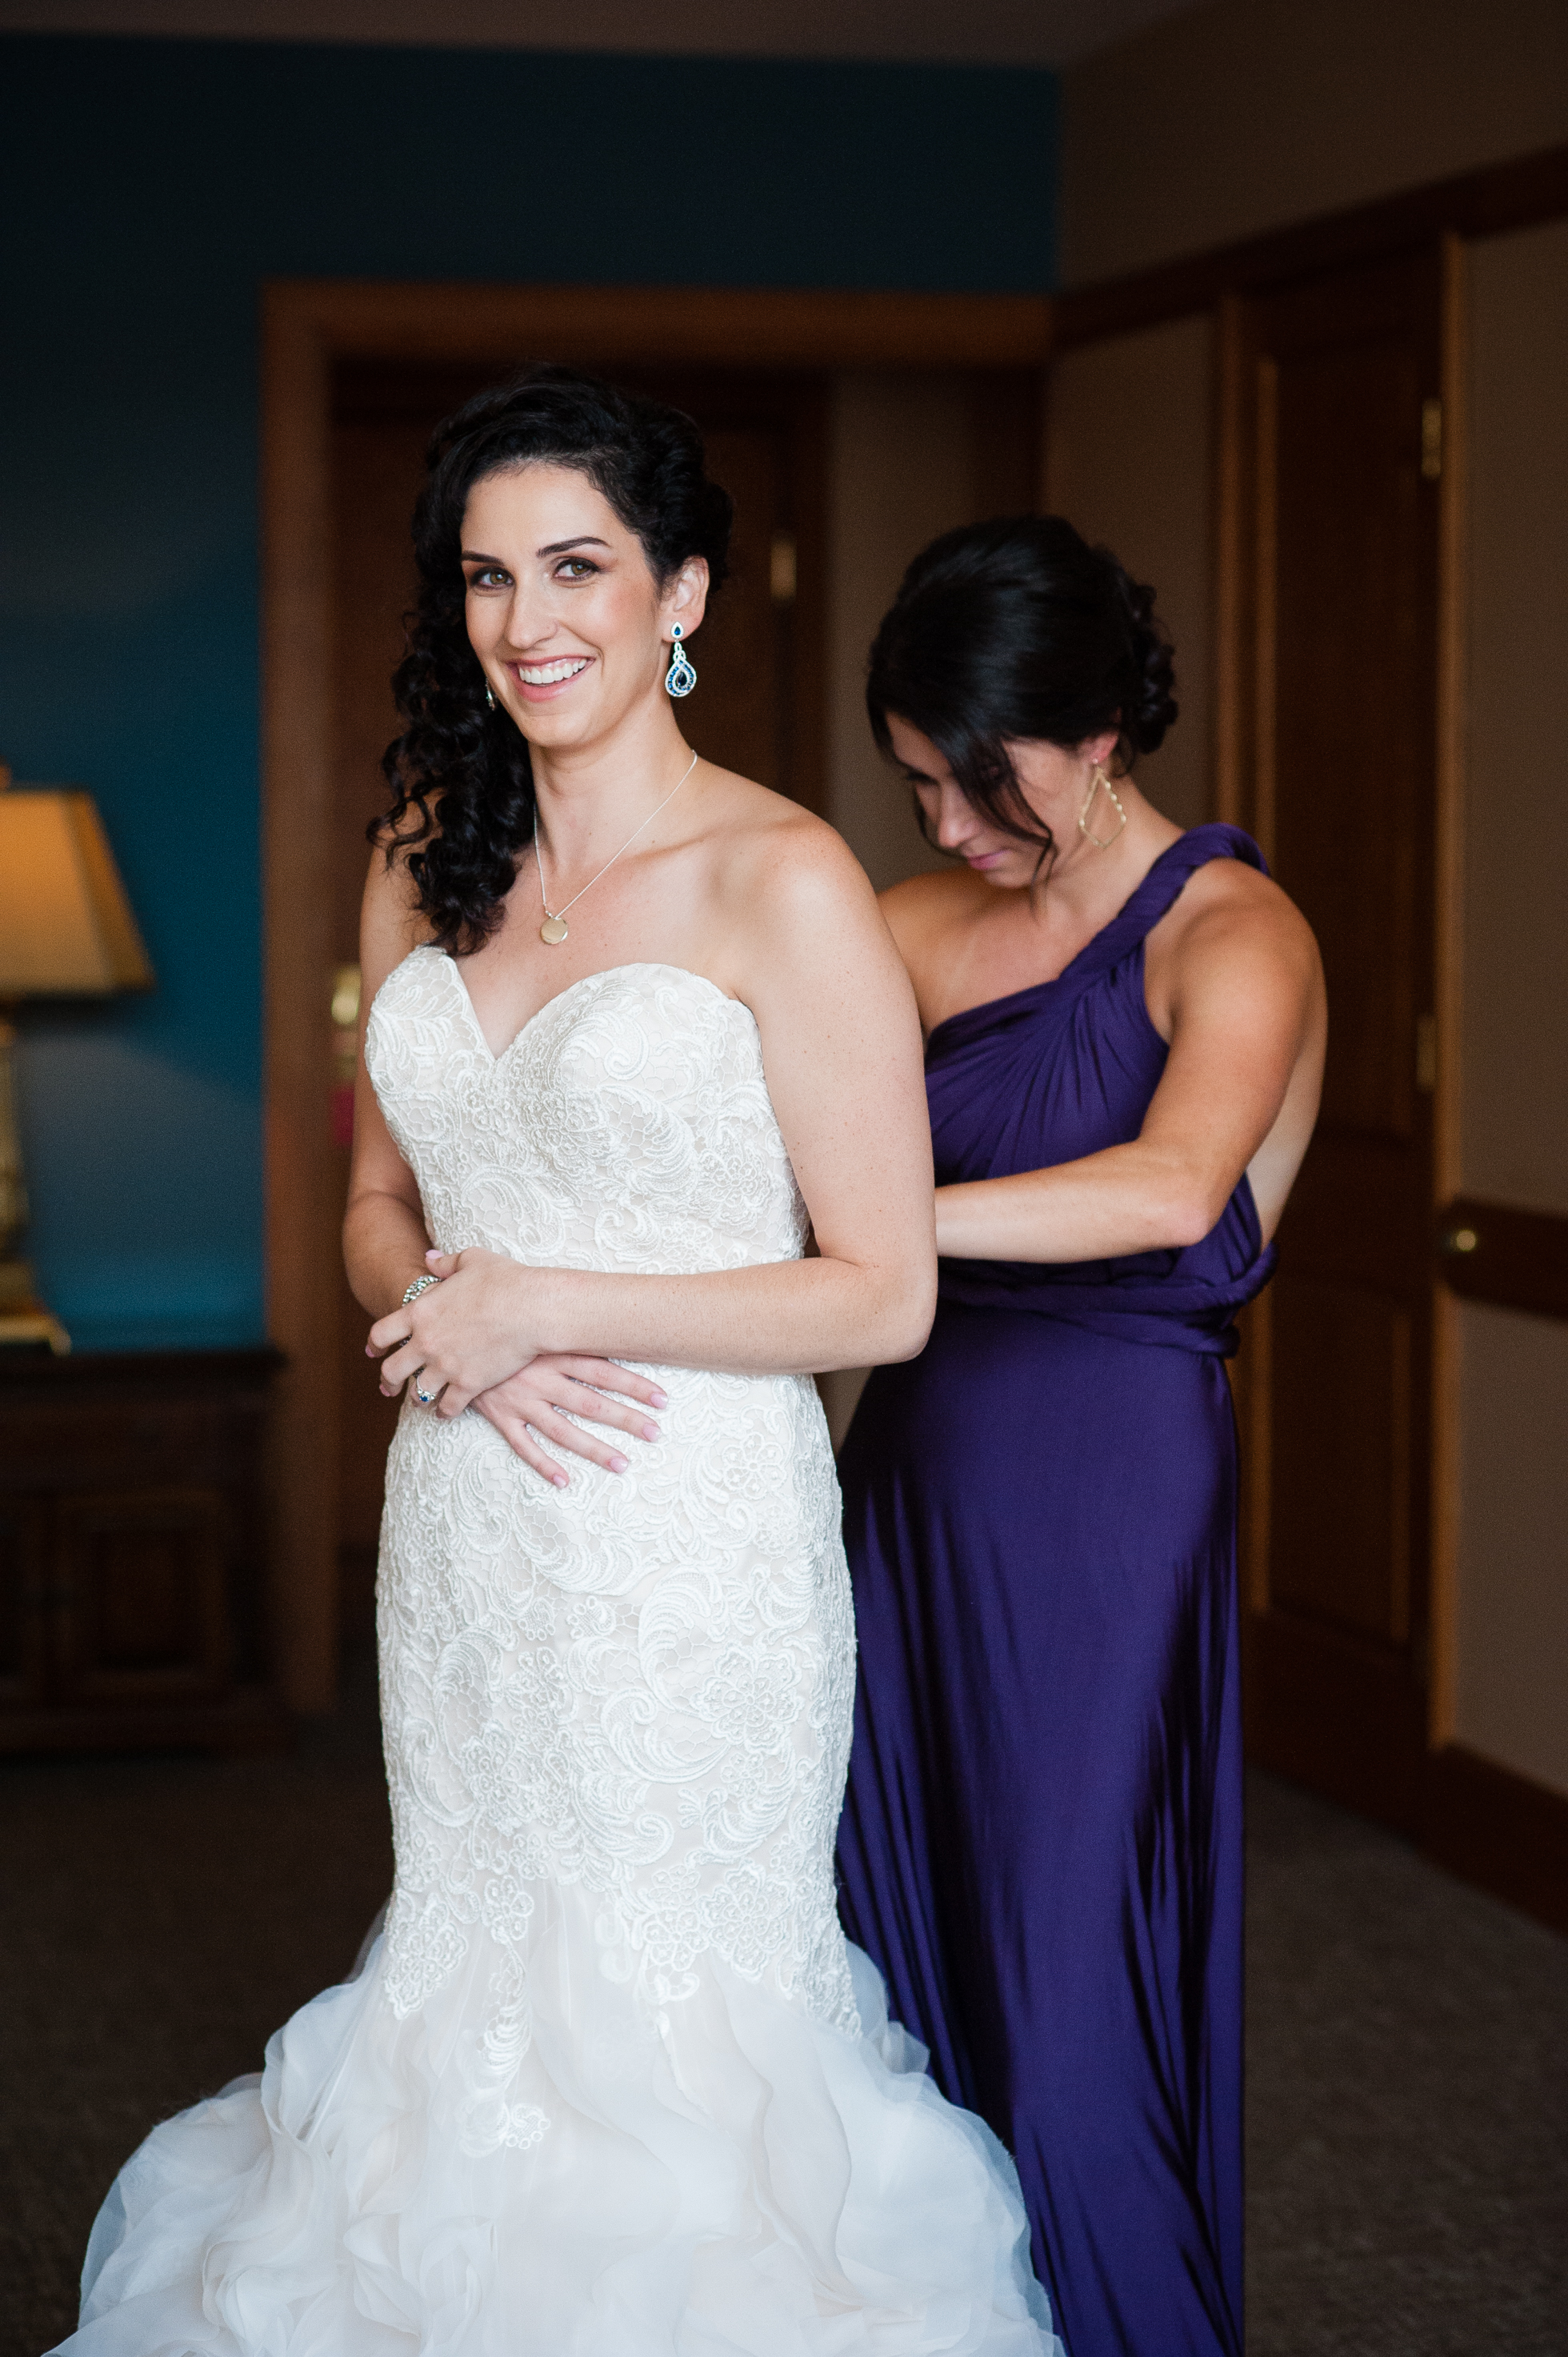 asheville bride getting dressed